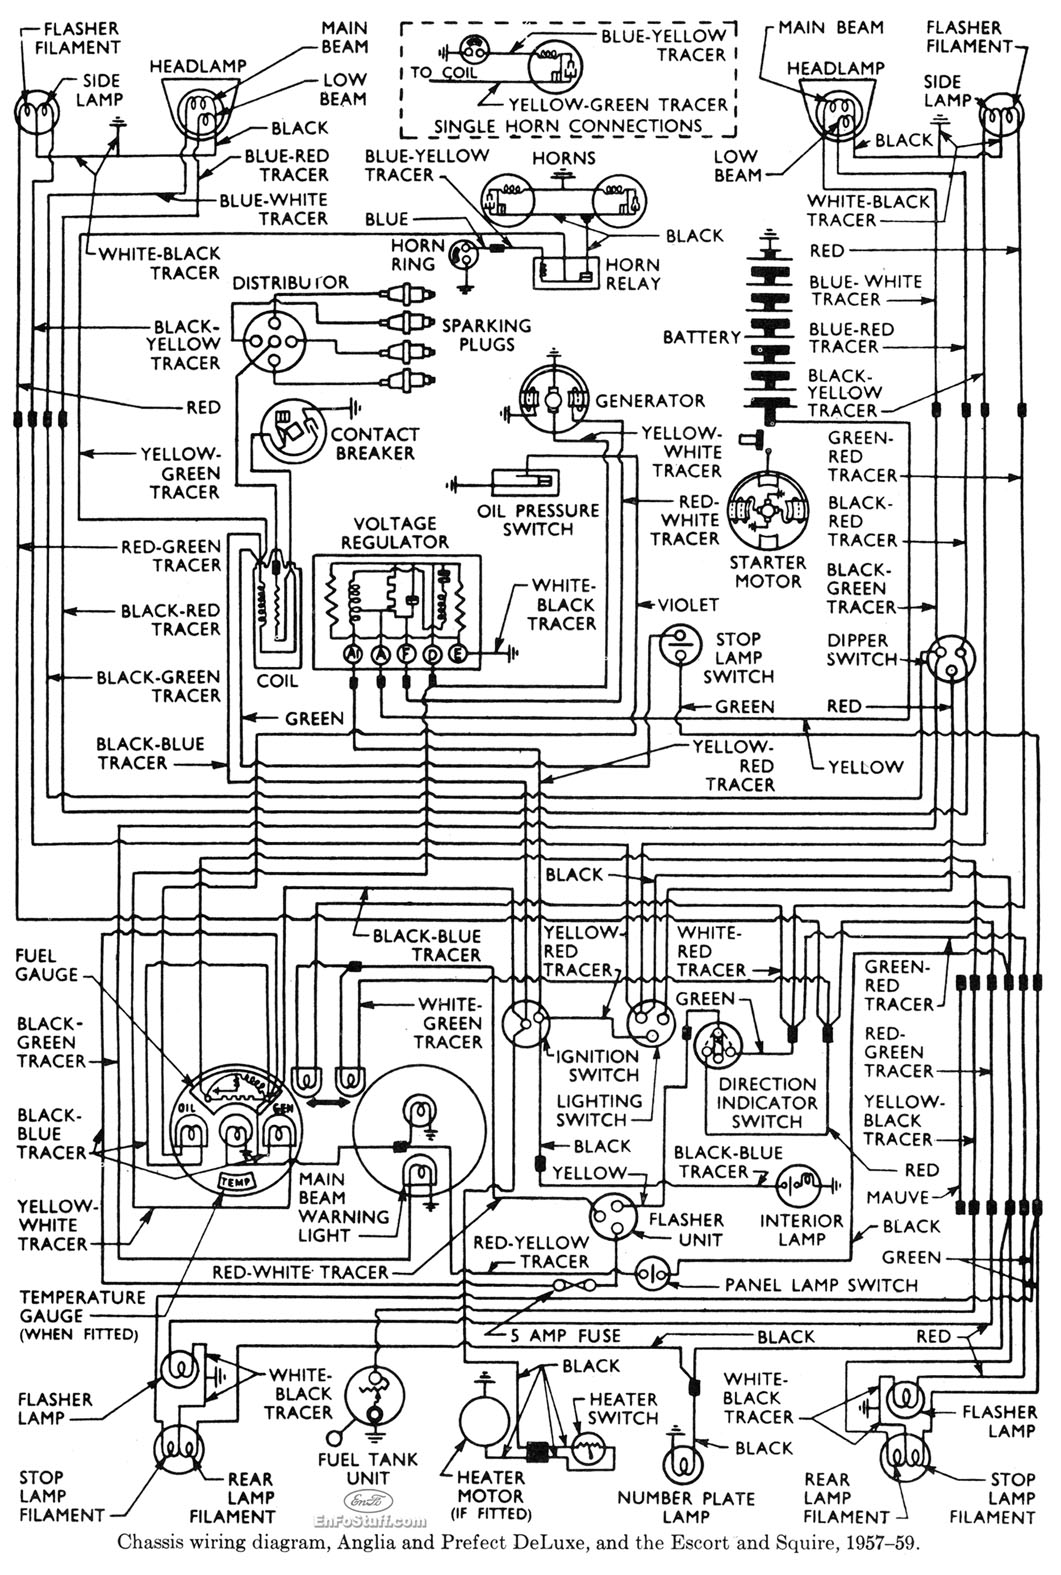 1987 Columbia Par Car Wiring Diagram Detailed Diagrams 1989 Club Battery Schematic Manual Of U2022